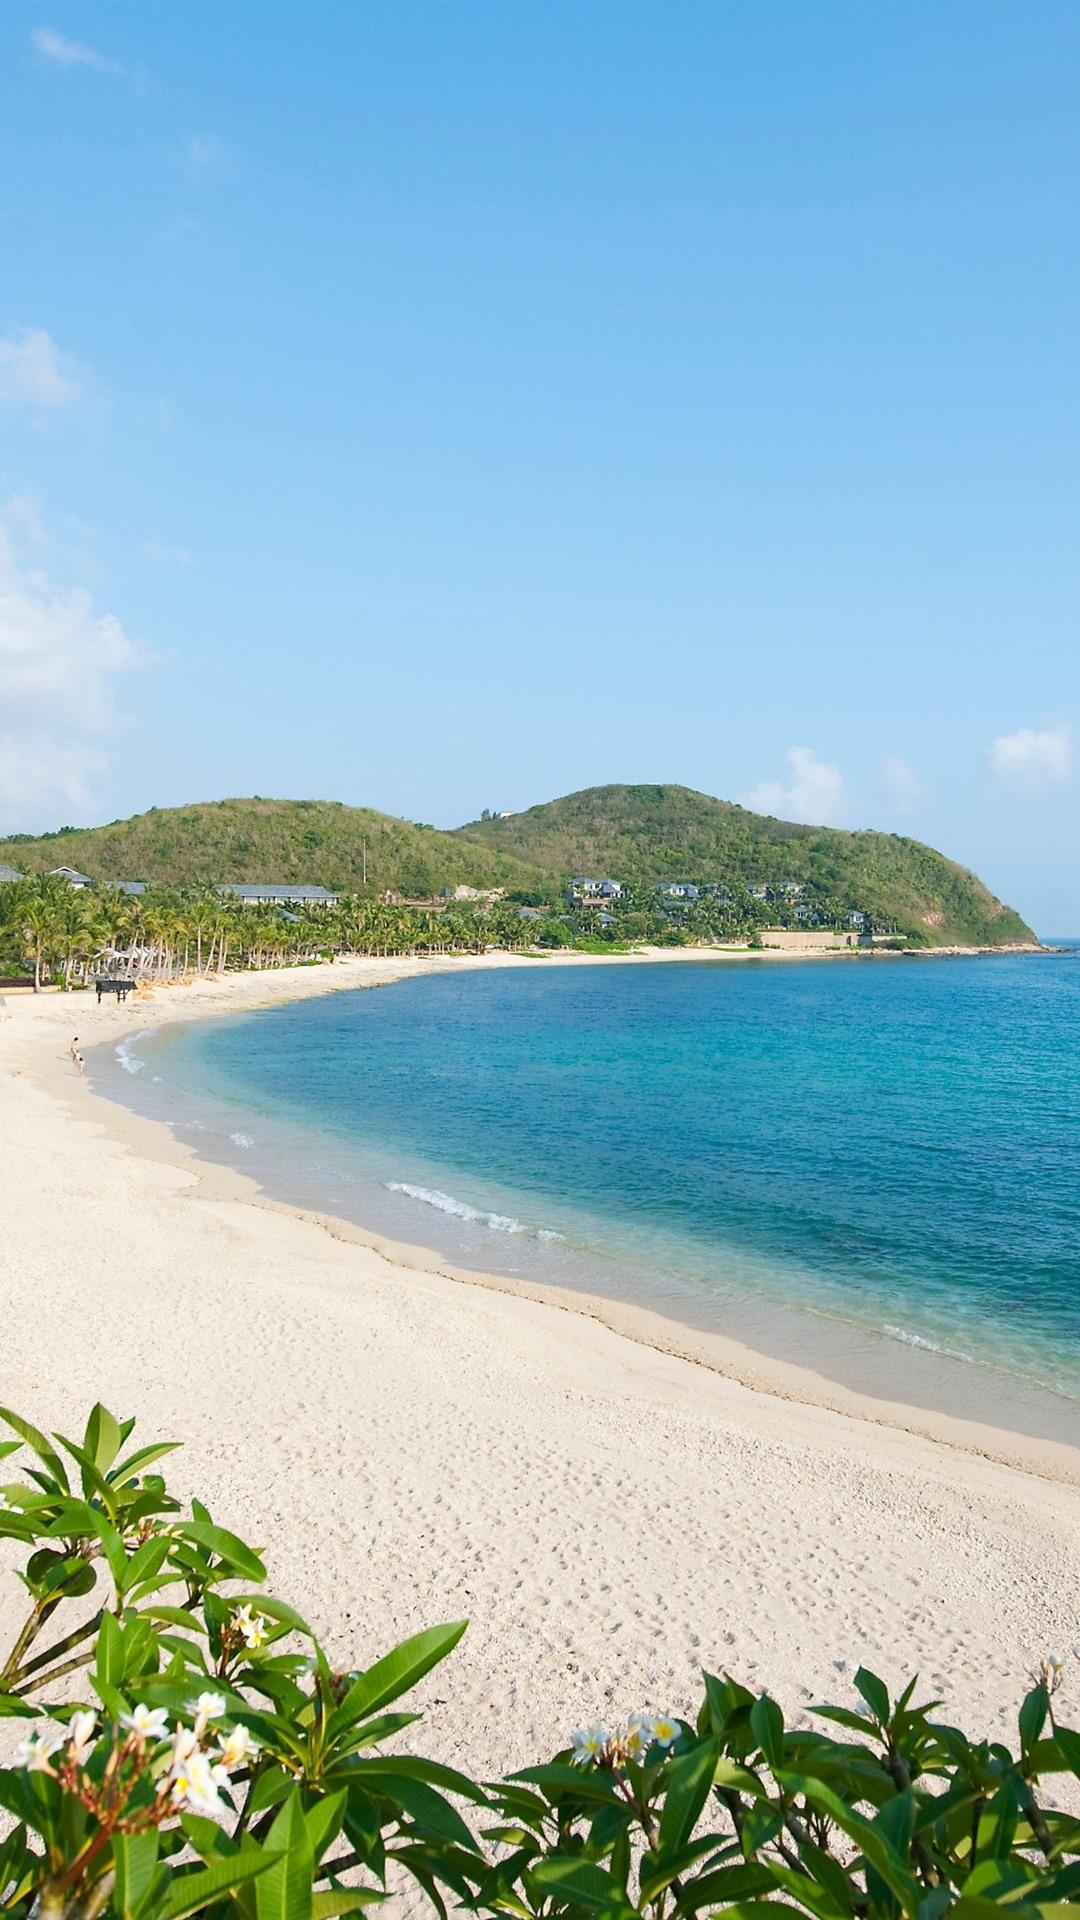 Beach Sea Palm Trees Tropical Blue Sky 1080x1920 Iphone